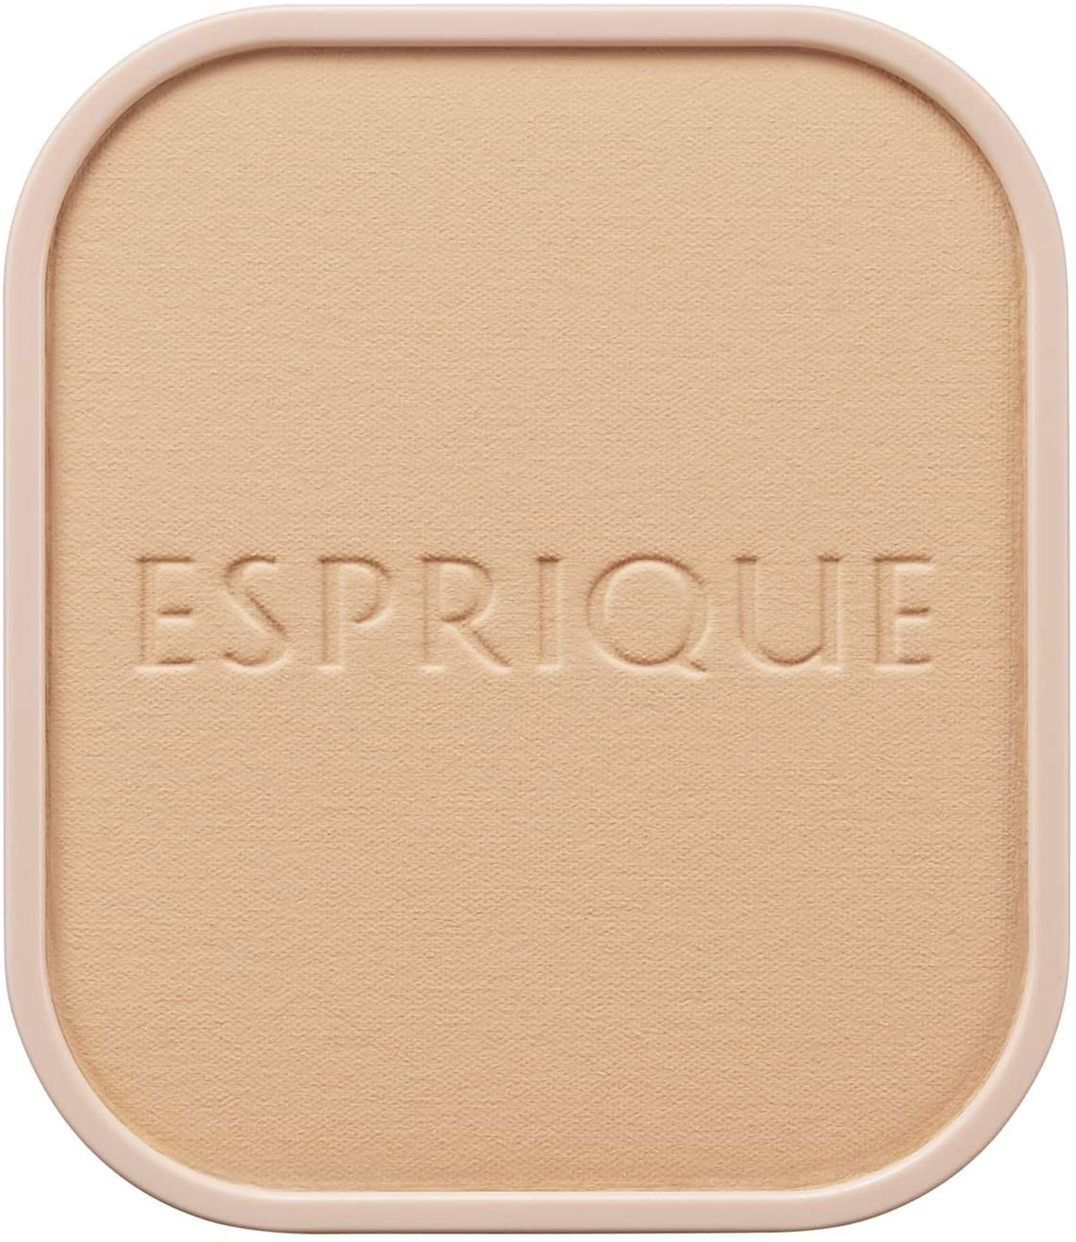 ESPRIQUE(エスプリーク)シンクロフィット パクト EX